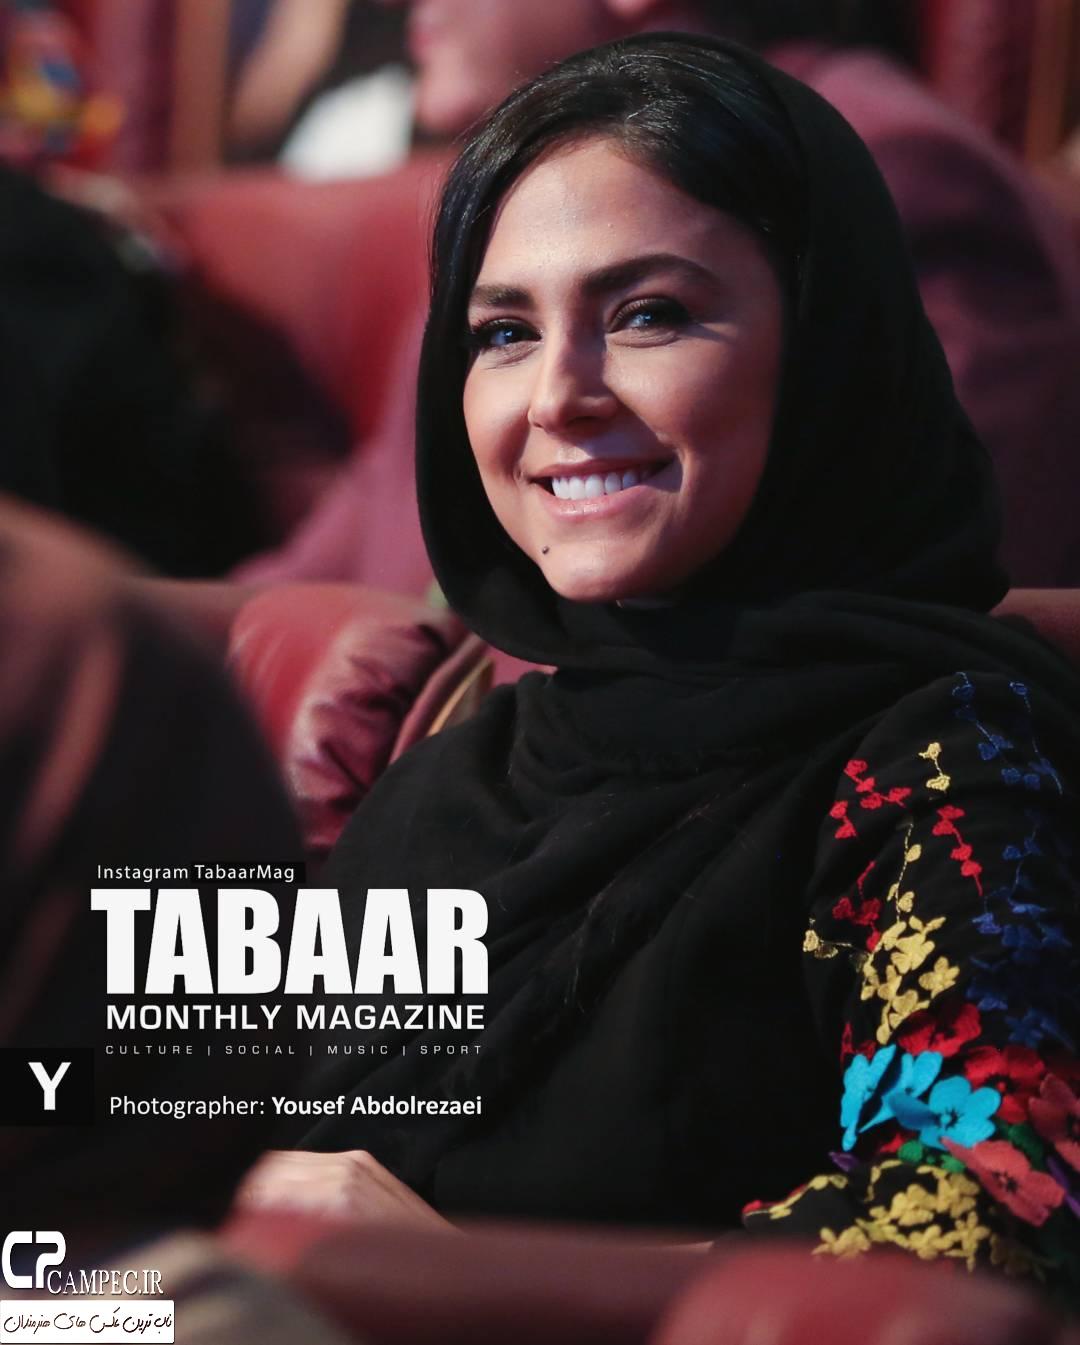 هدی زین العابدین در جشن پایان سریال شهرزاد